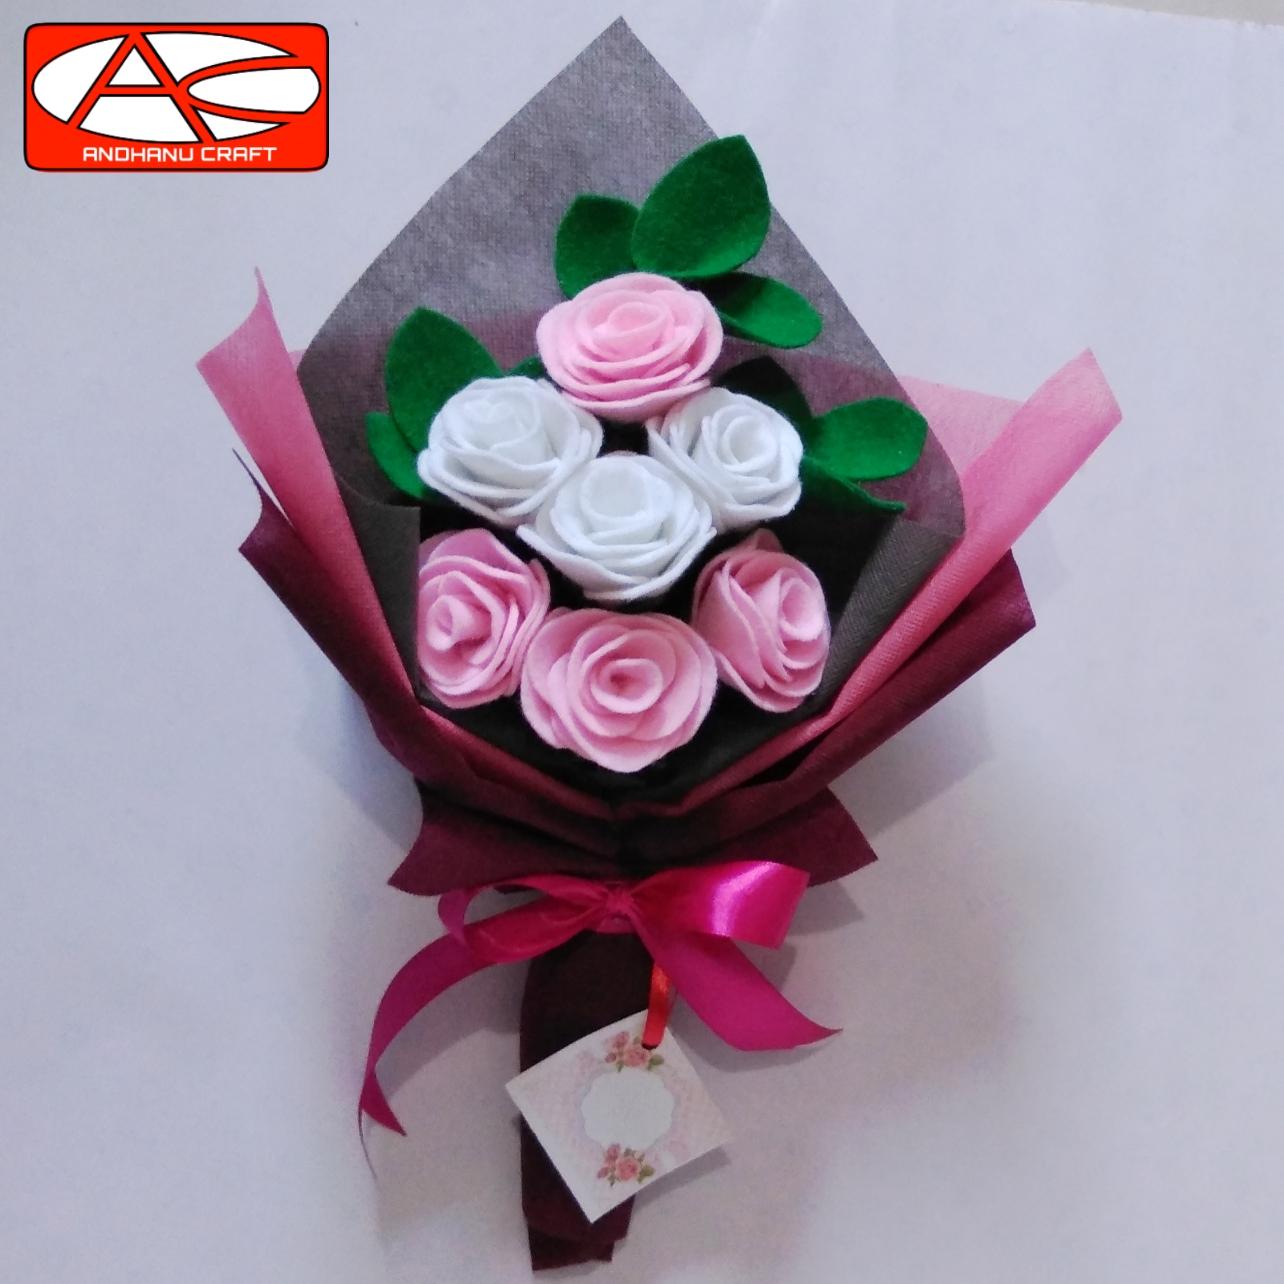 Hand Buket Bunga Mawar Flanel 7 Tangkai Kado Wisuda Hadiah Orang